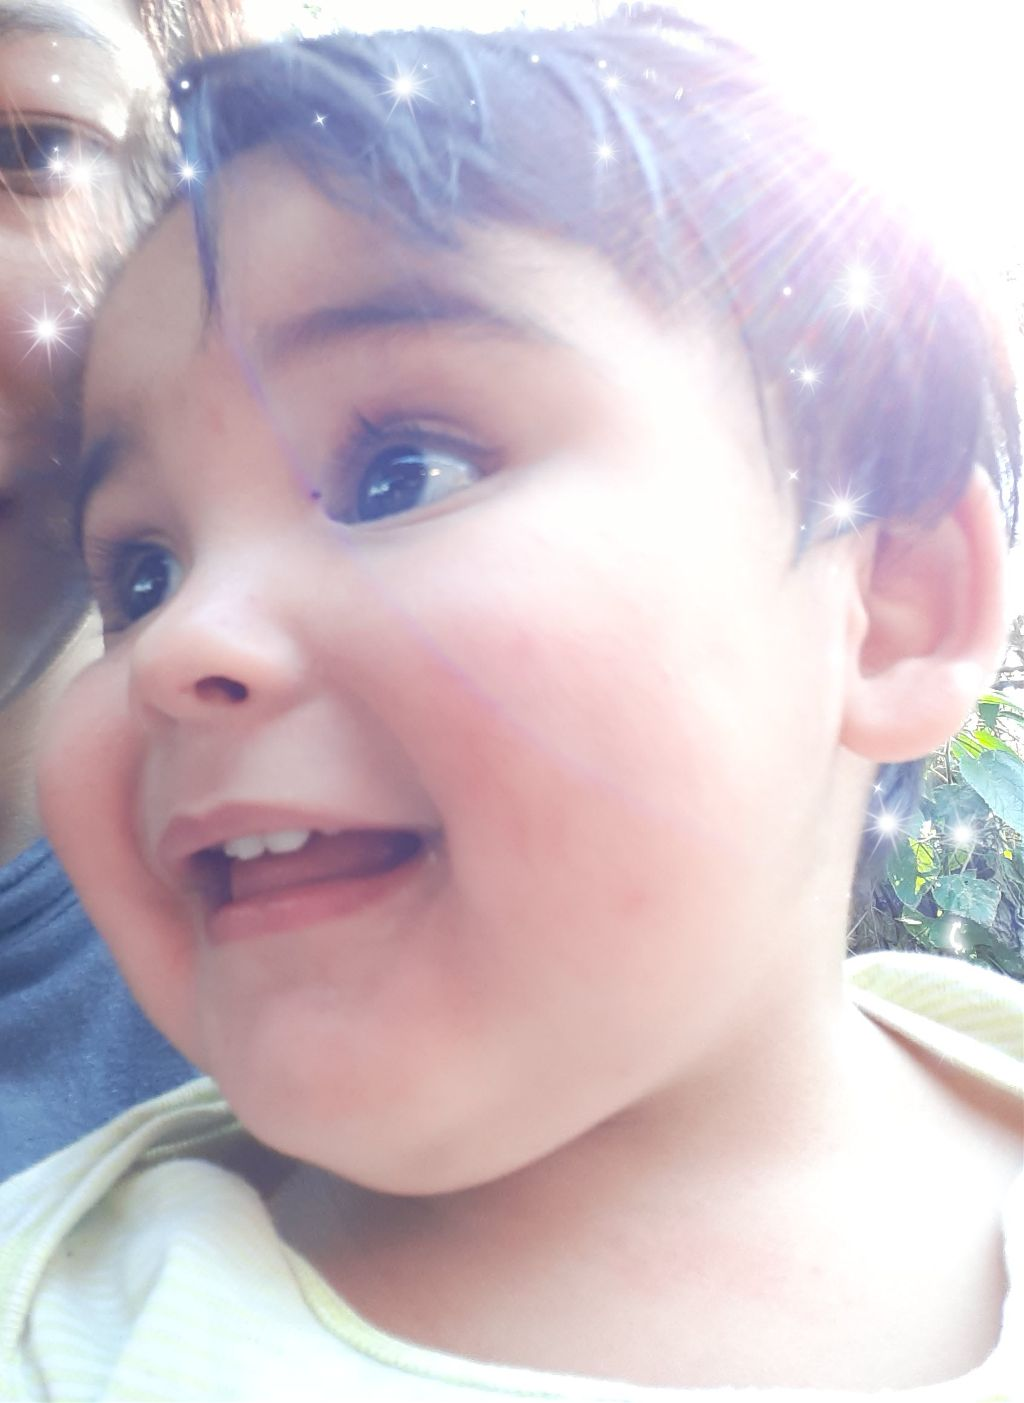 Ojalá siempre pueda verte sonreír #bebito